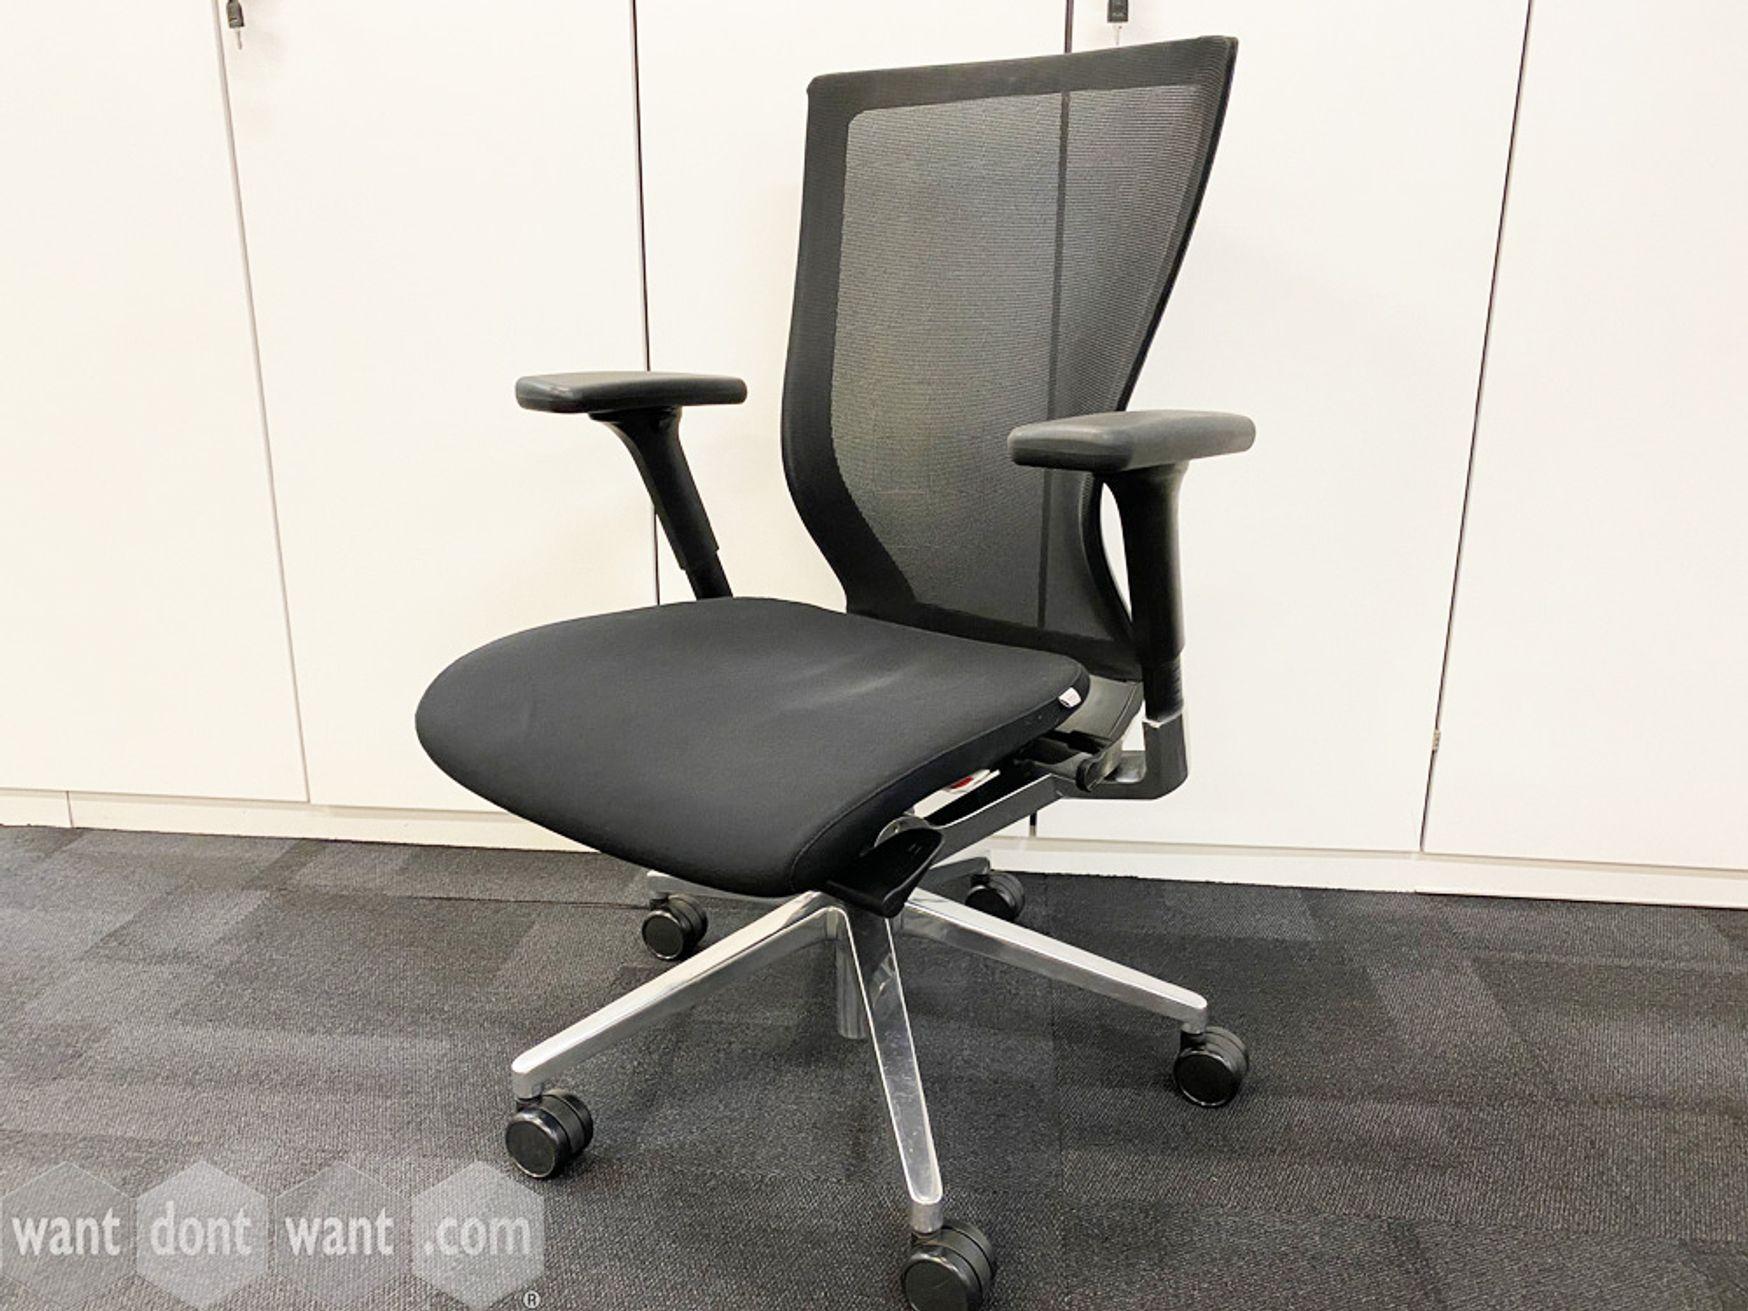 Used Sidiz task chairs with mesh backs, black upholstered seat and chrome base.